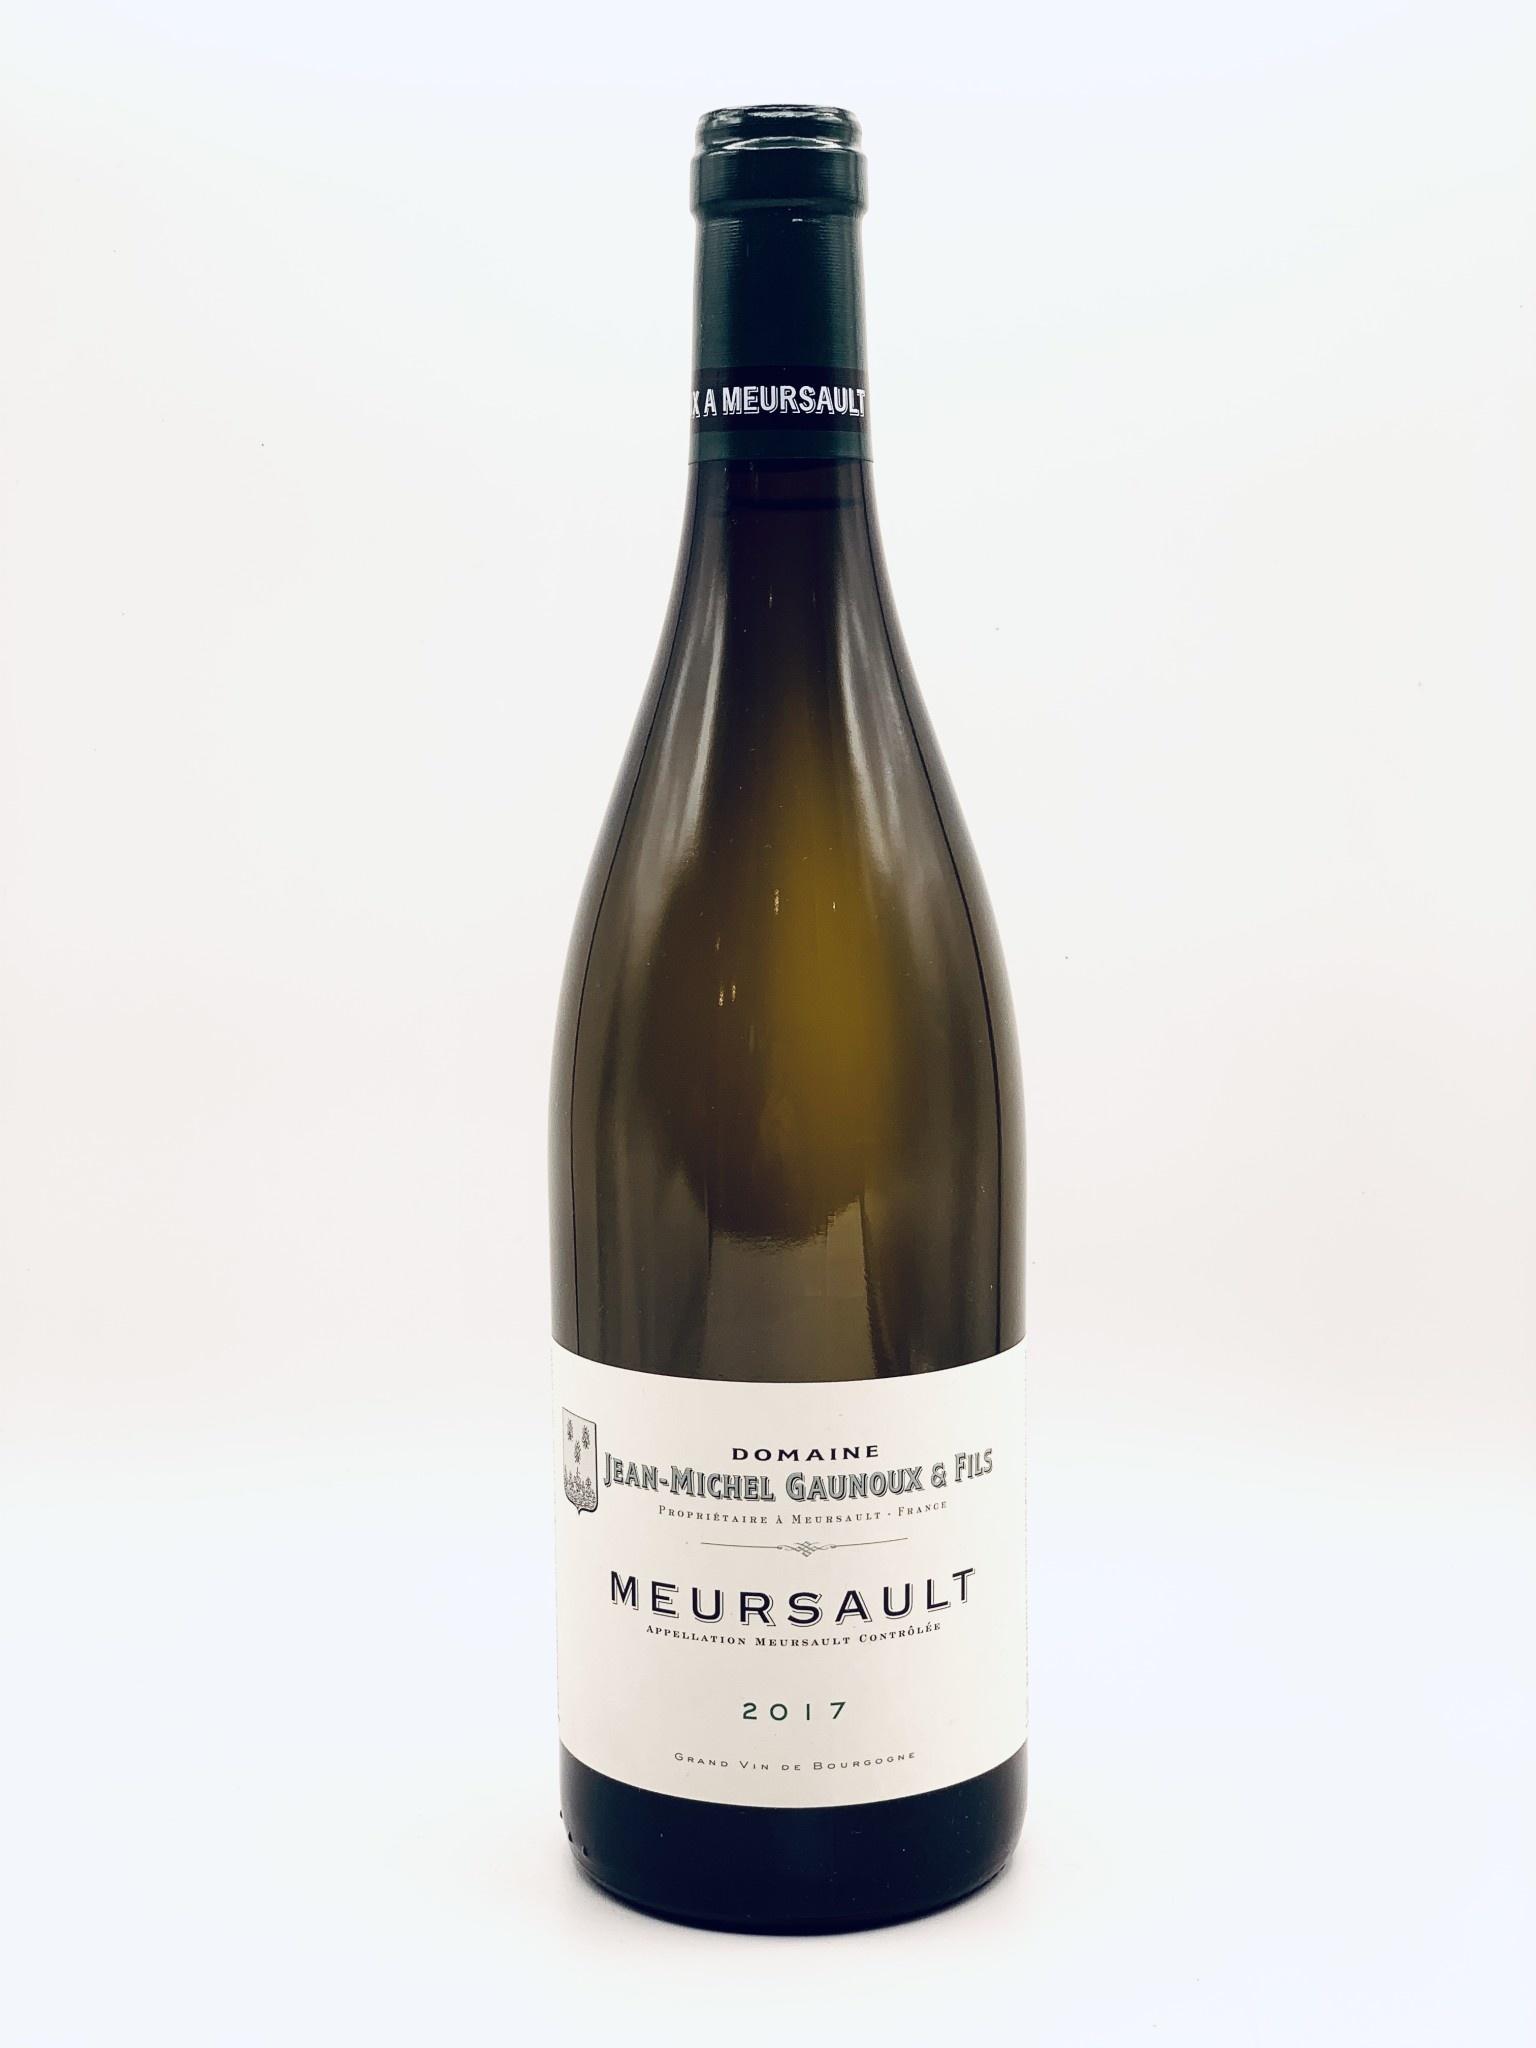 Meursault 2017 Jean-Michel Gaunoux 750ml